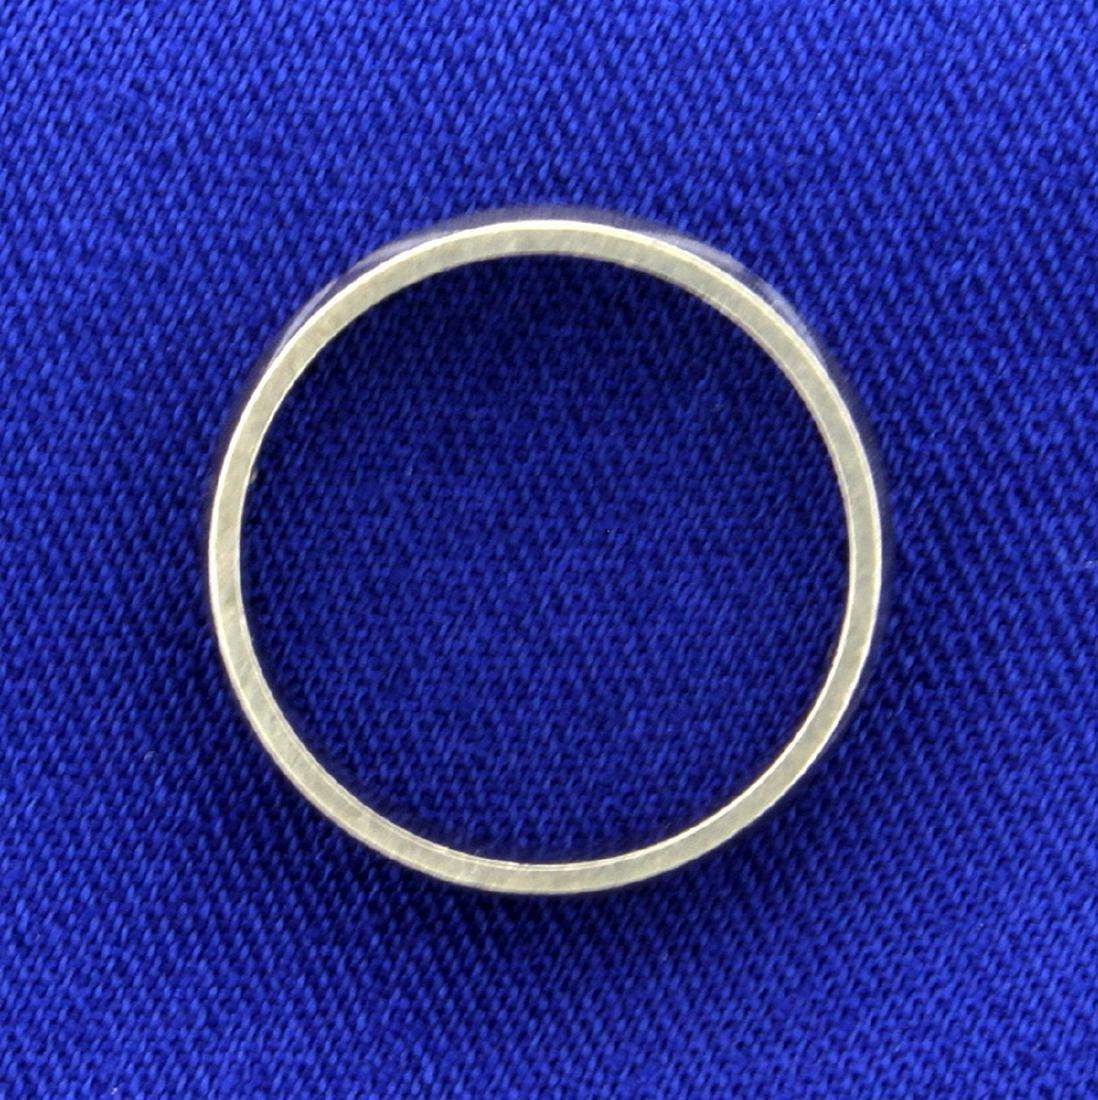 Woman's White Gold Wedding Band Ring - 2